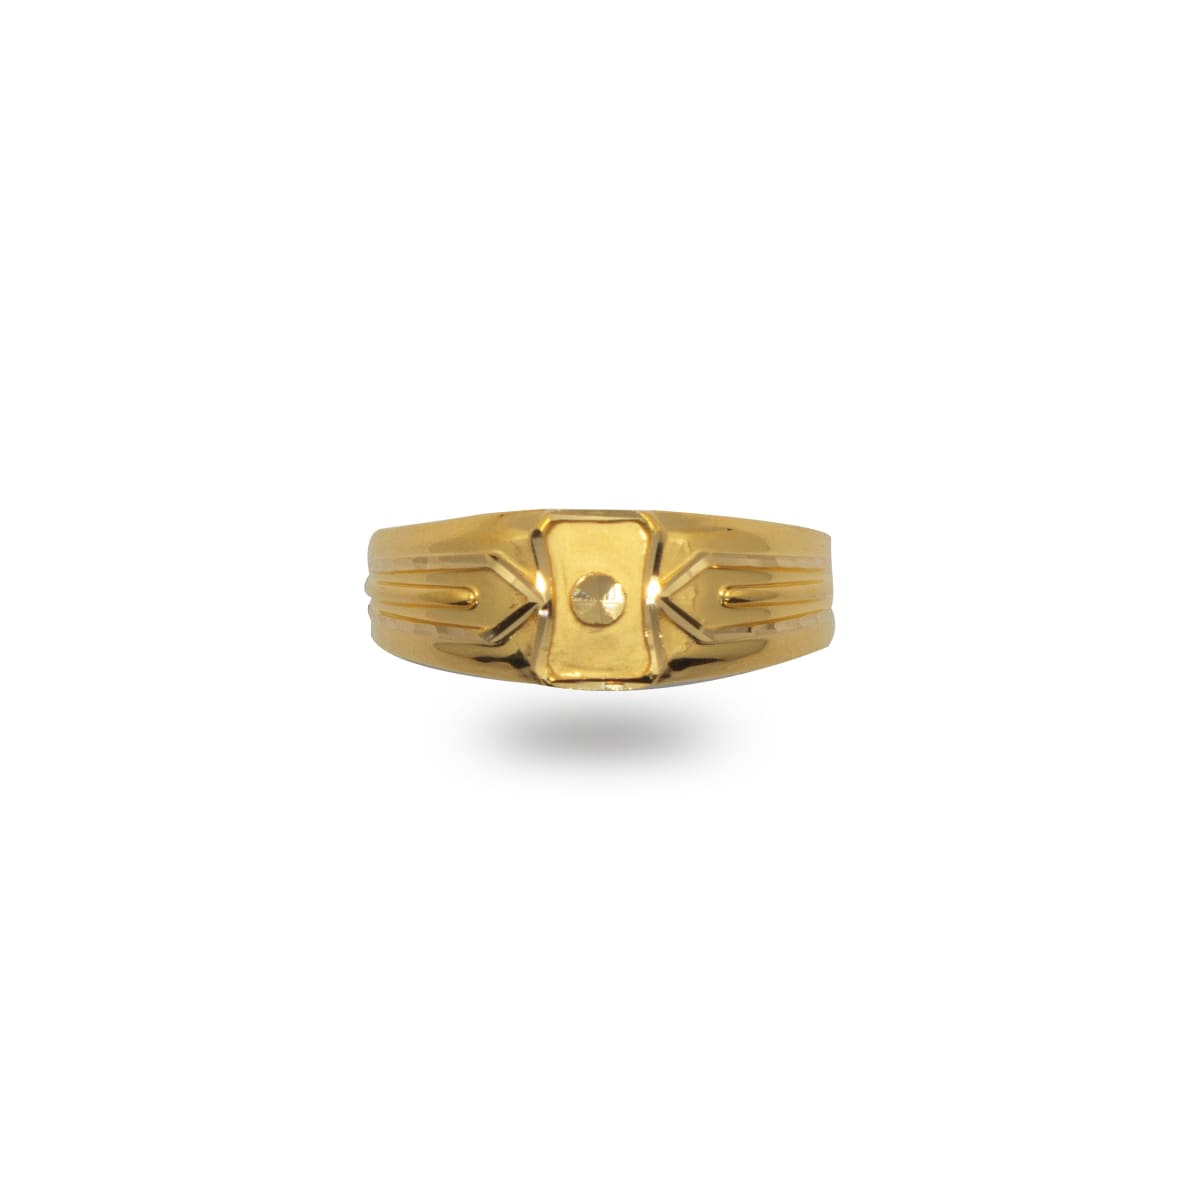 Surya Gents Ring